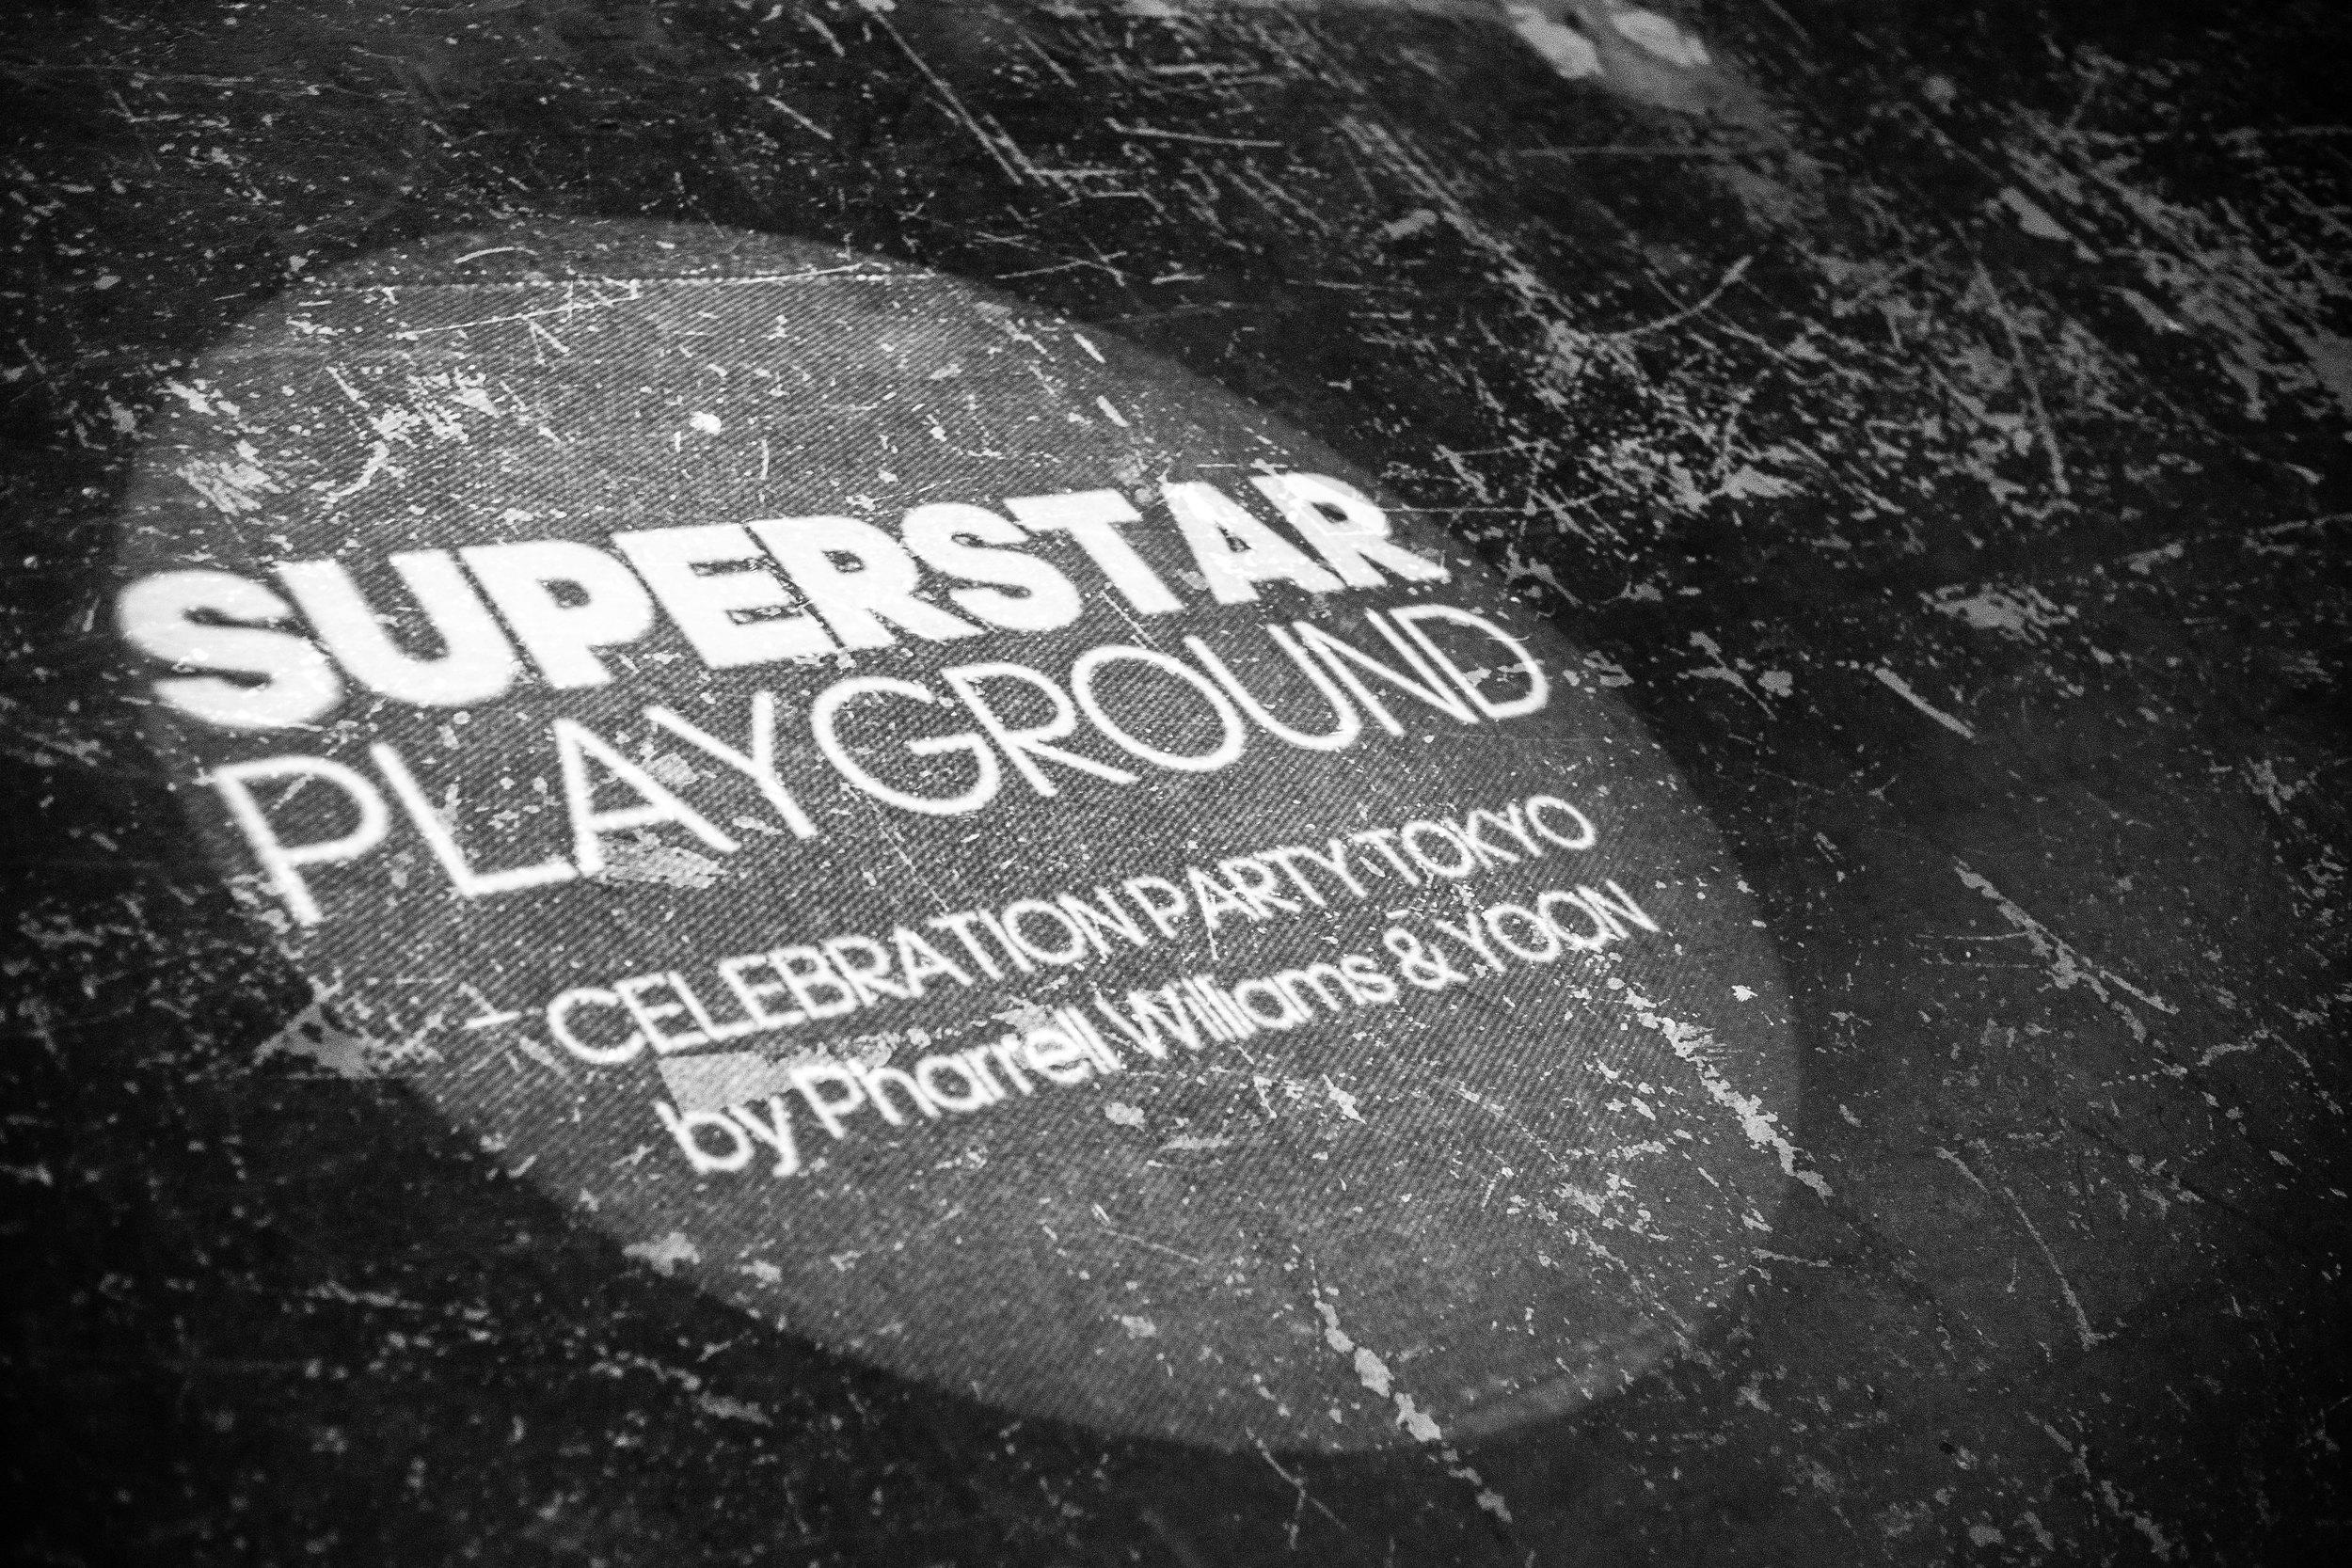 Welcome to Superstar Playground